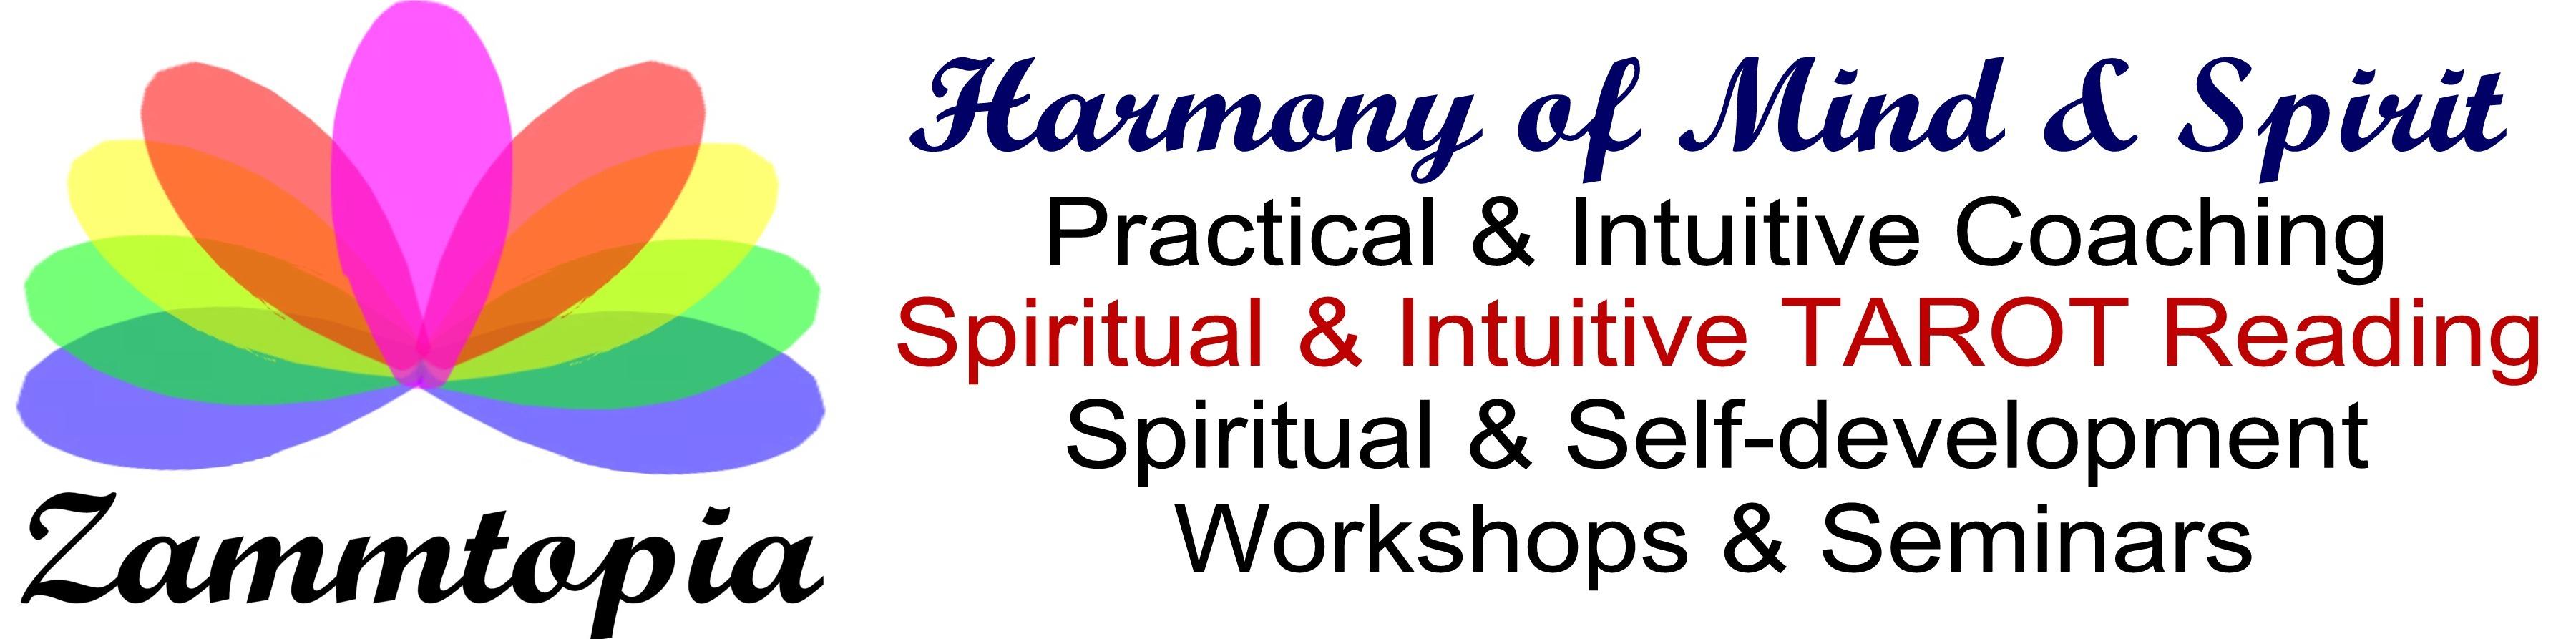 Zammtopia - Harmony of Mind and Spirit